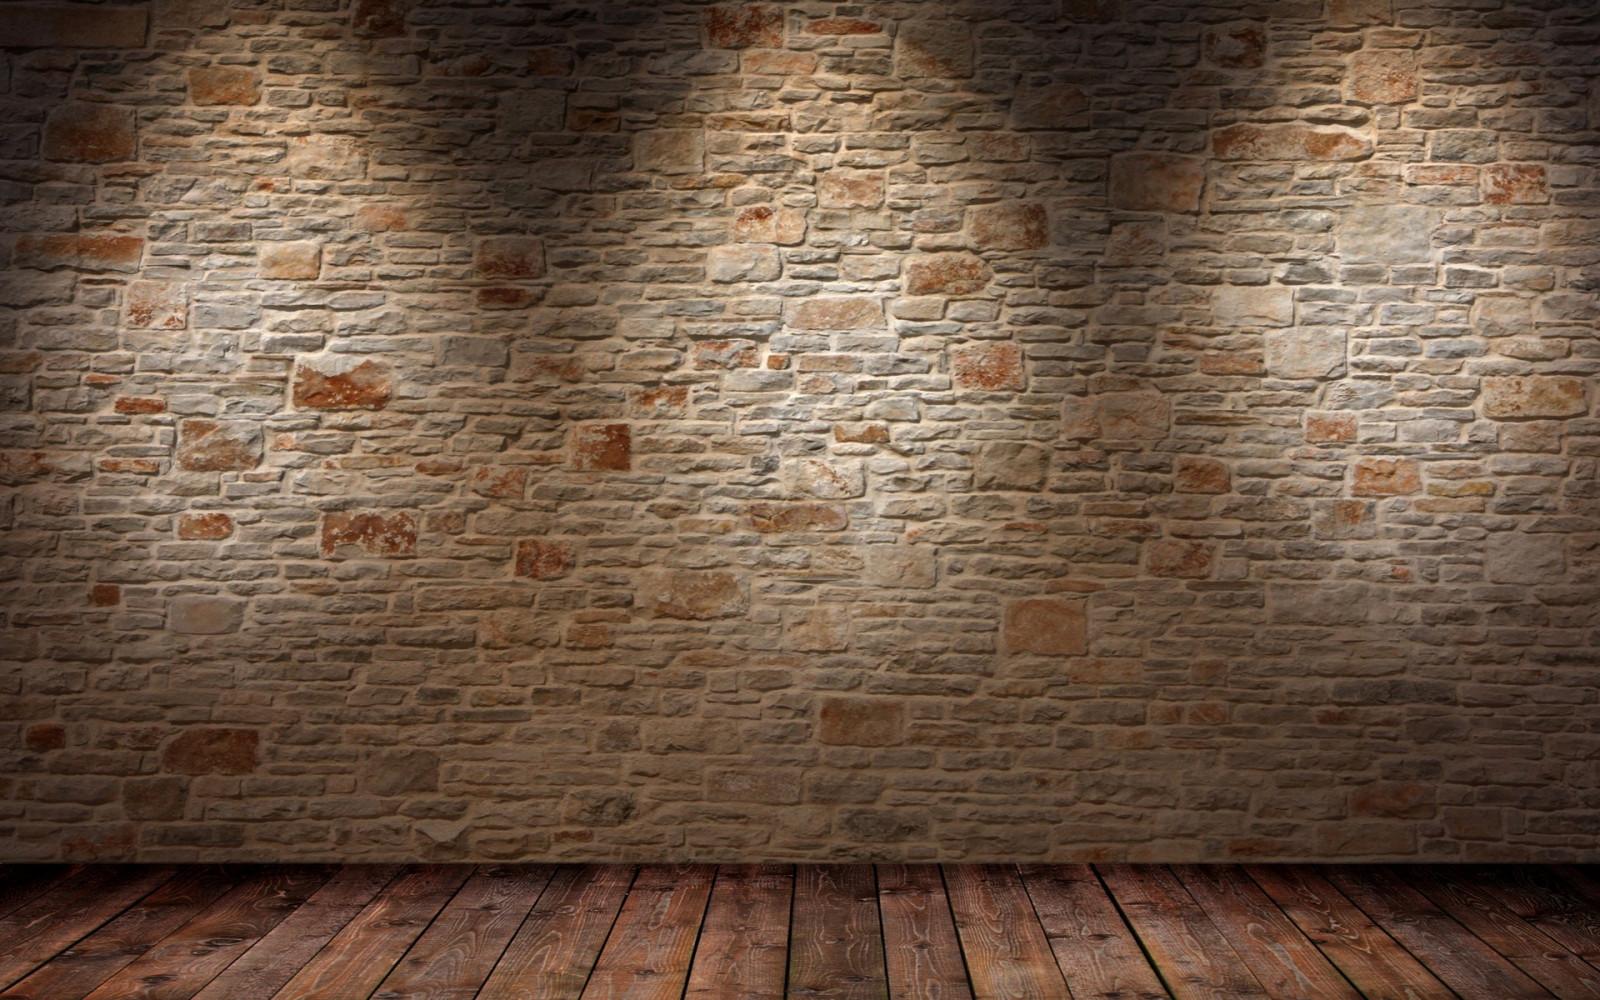 mauer holz textur fliese ziegel material stock linie hartholz bodenbelag holzboden laminatboden mauerwerk - Hartholz Oder Laminatboden